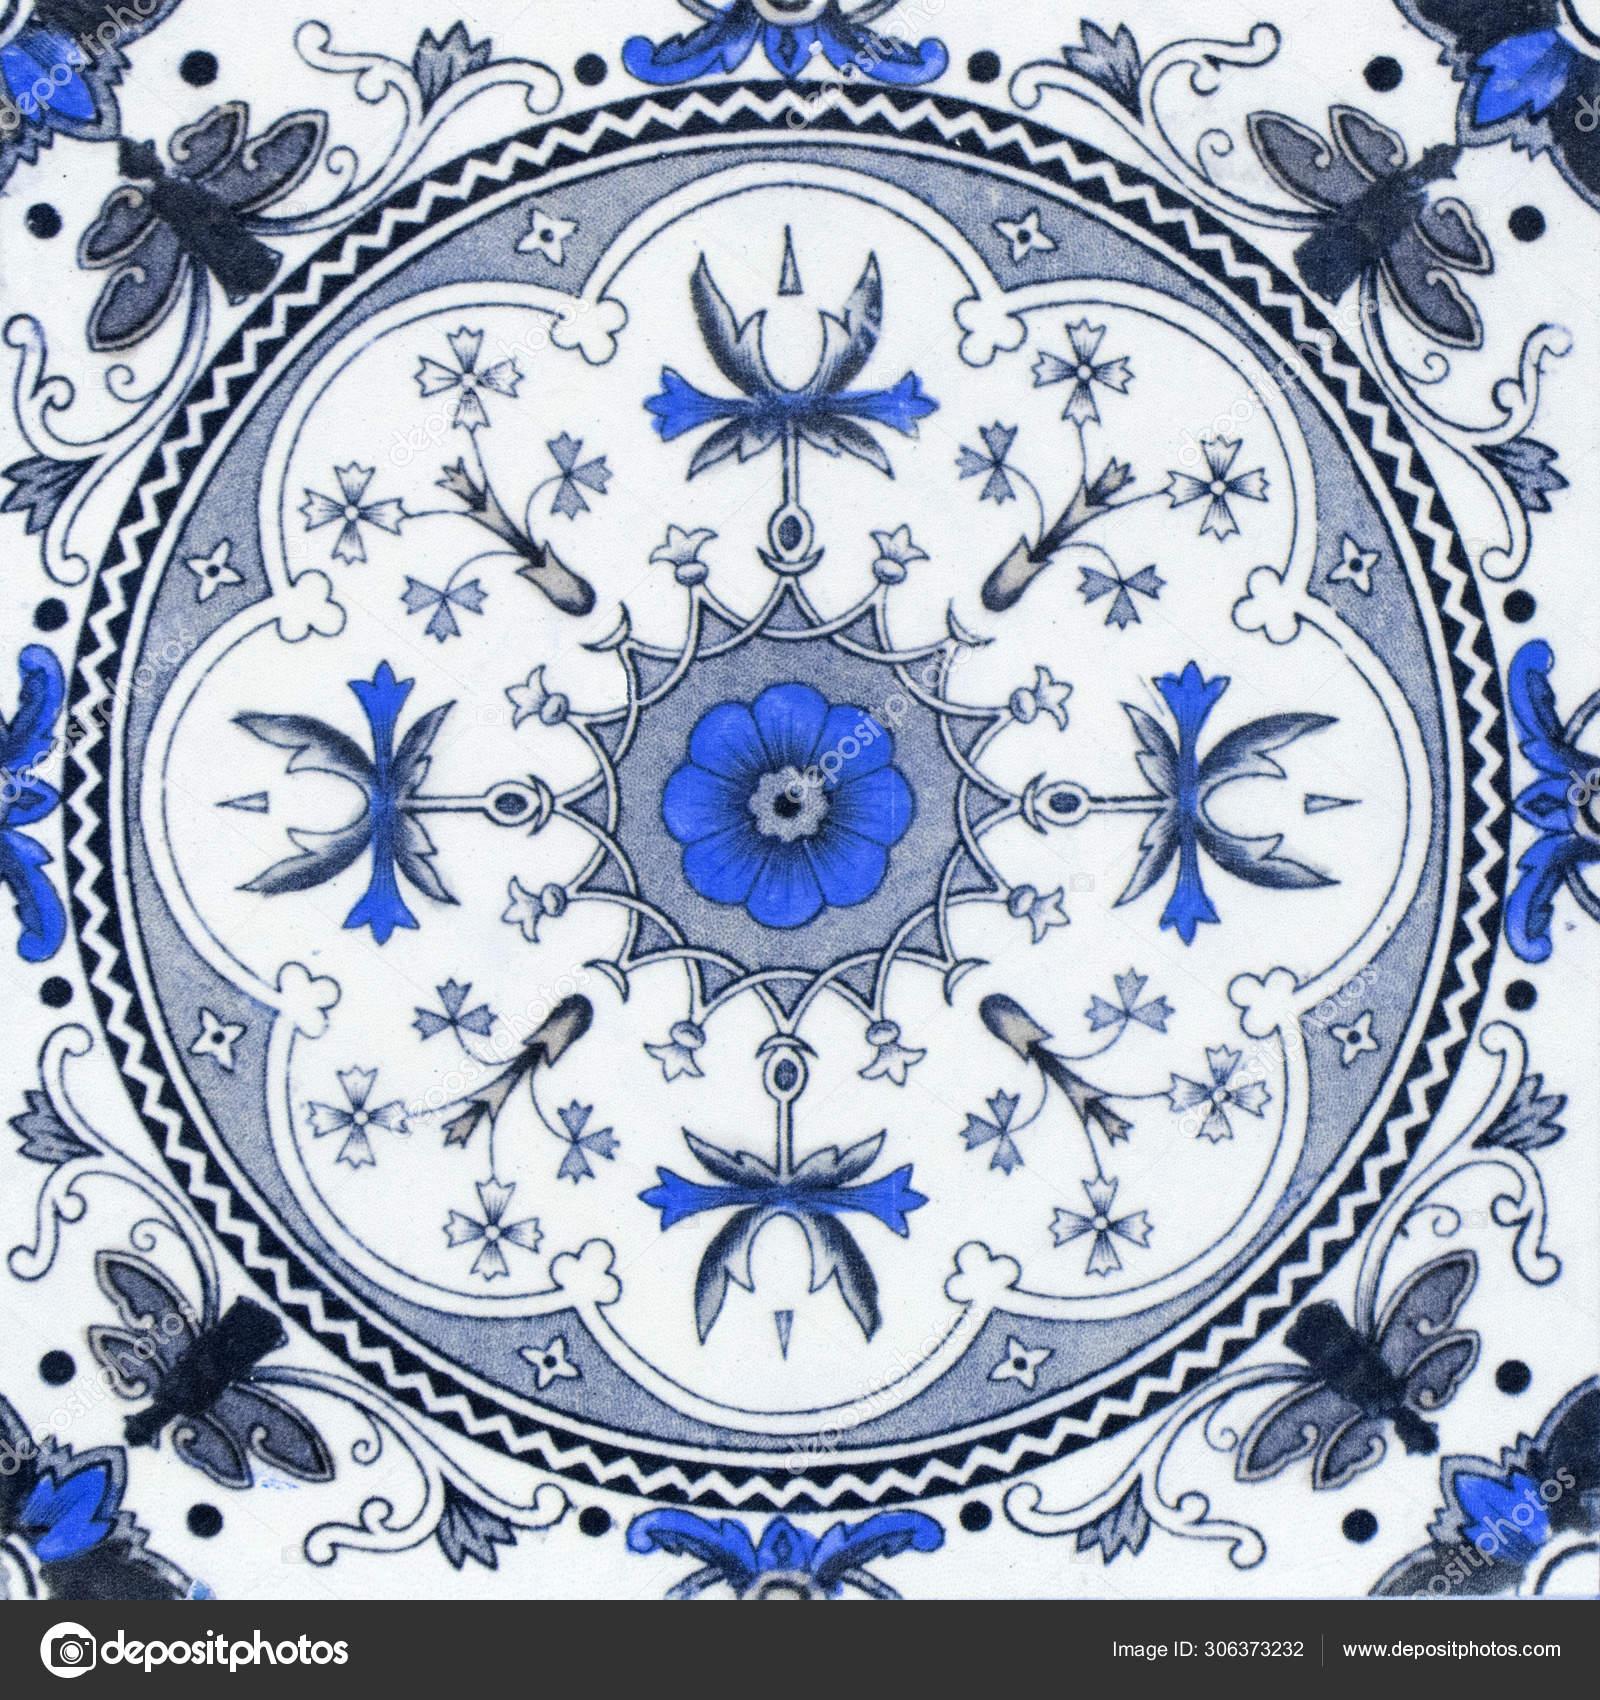 Vintage Ceramic Tiles Wall Decoration Turkish Ceramic Tiles Wall Stock Photo C Scmode3 Gmail Com 306373232